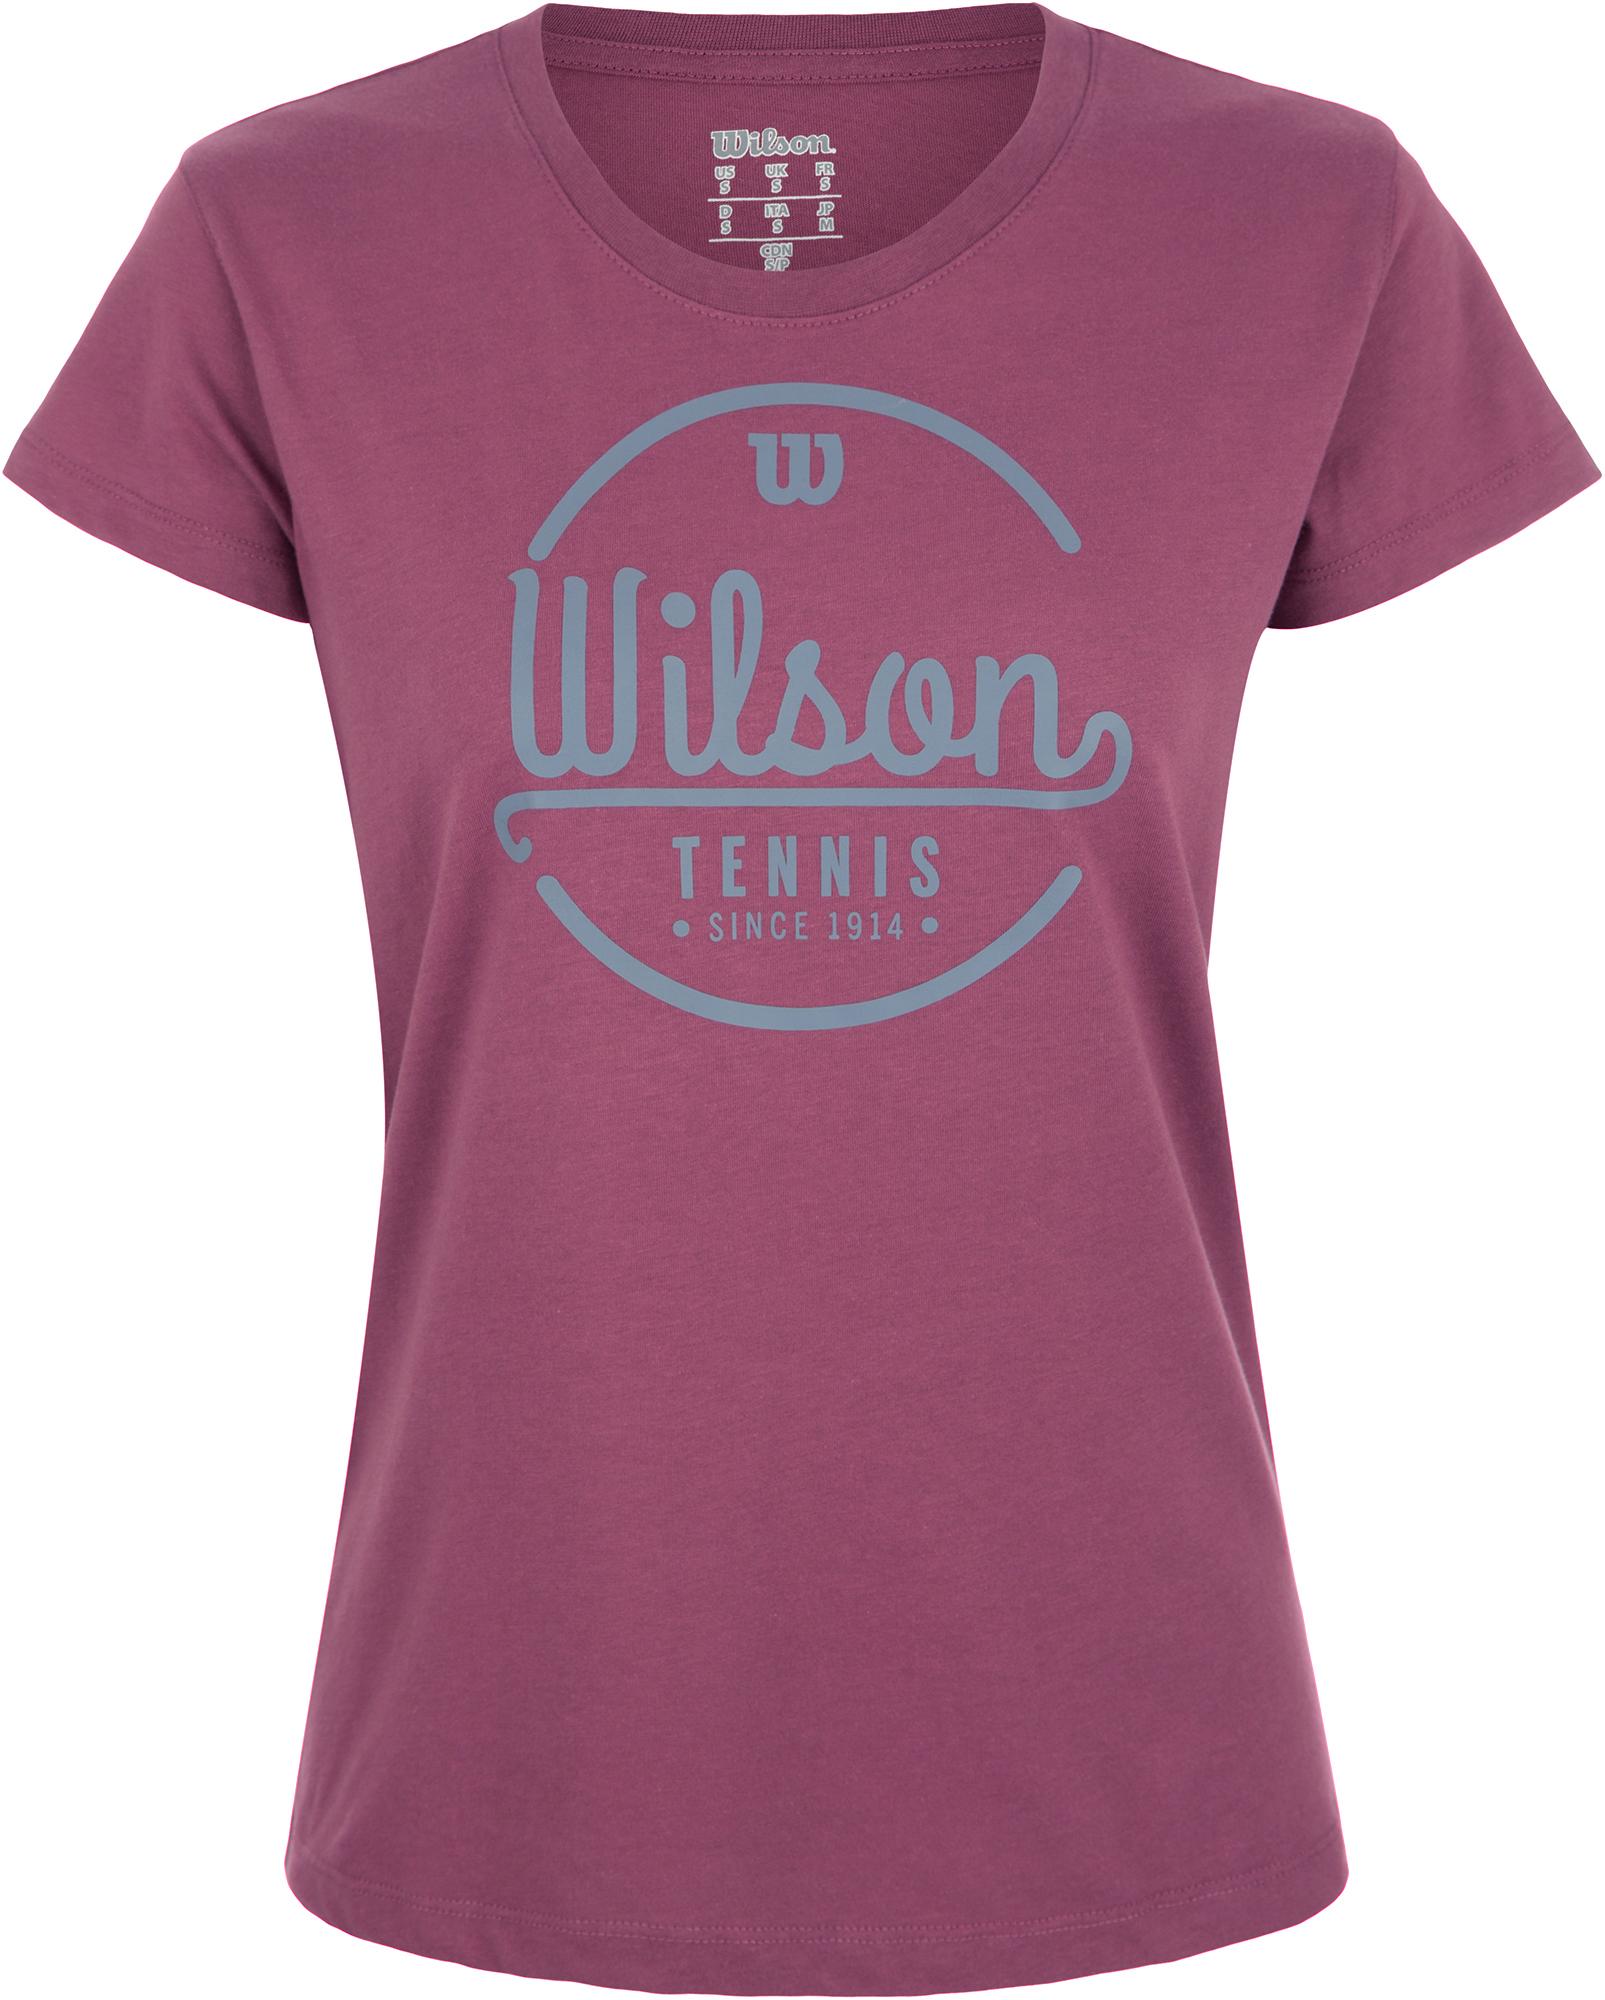 Wilson Футболка женская Wilson Lineage Tech Tee, размер 44-46 футболка женская puma evo tee цвет персиковый 57511231 размер m 44 46